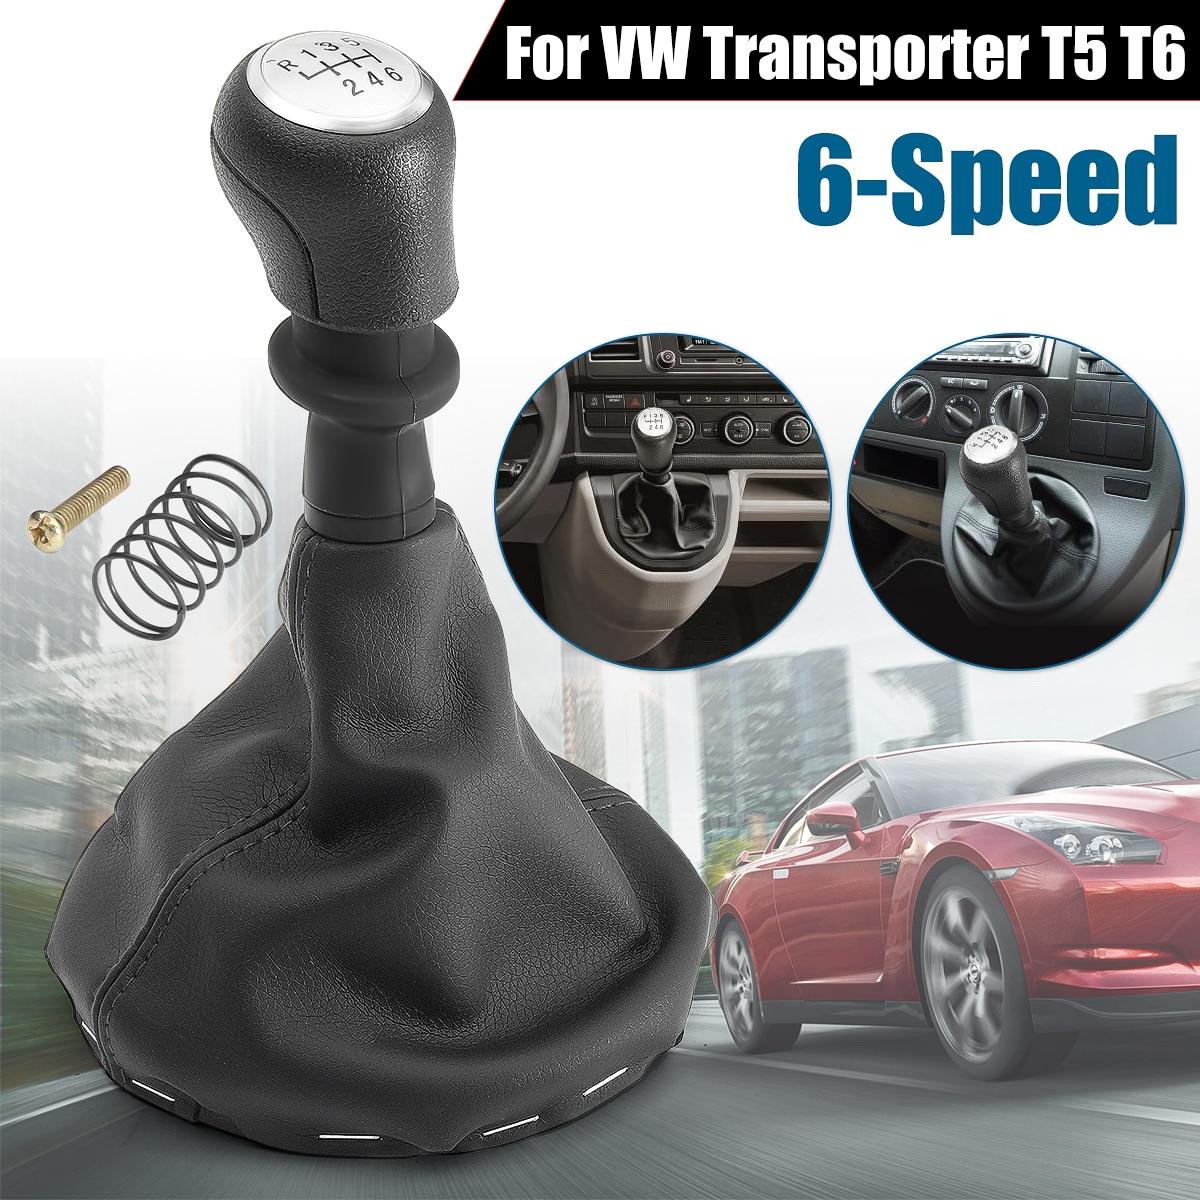 6 Speed Gear Stick Shift Knob Frame Boots For VW /Transporter T5 T6 #161412 Black メンズ 時計 ゼニス